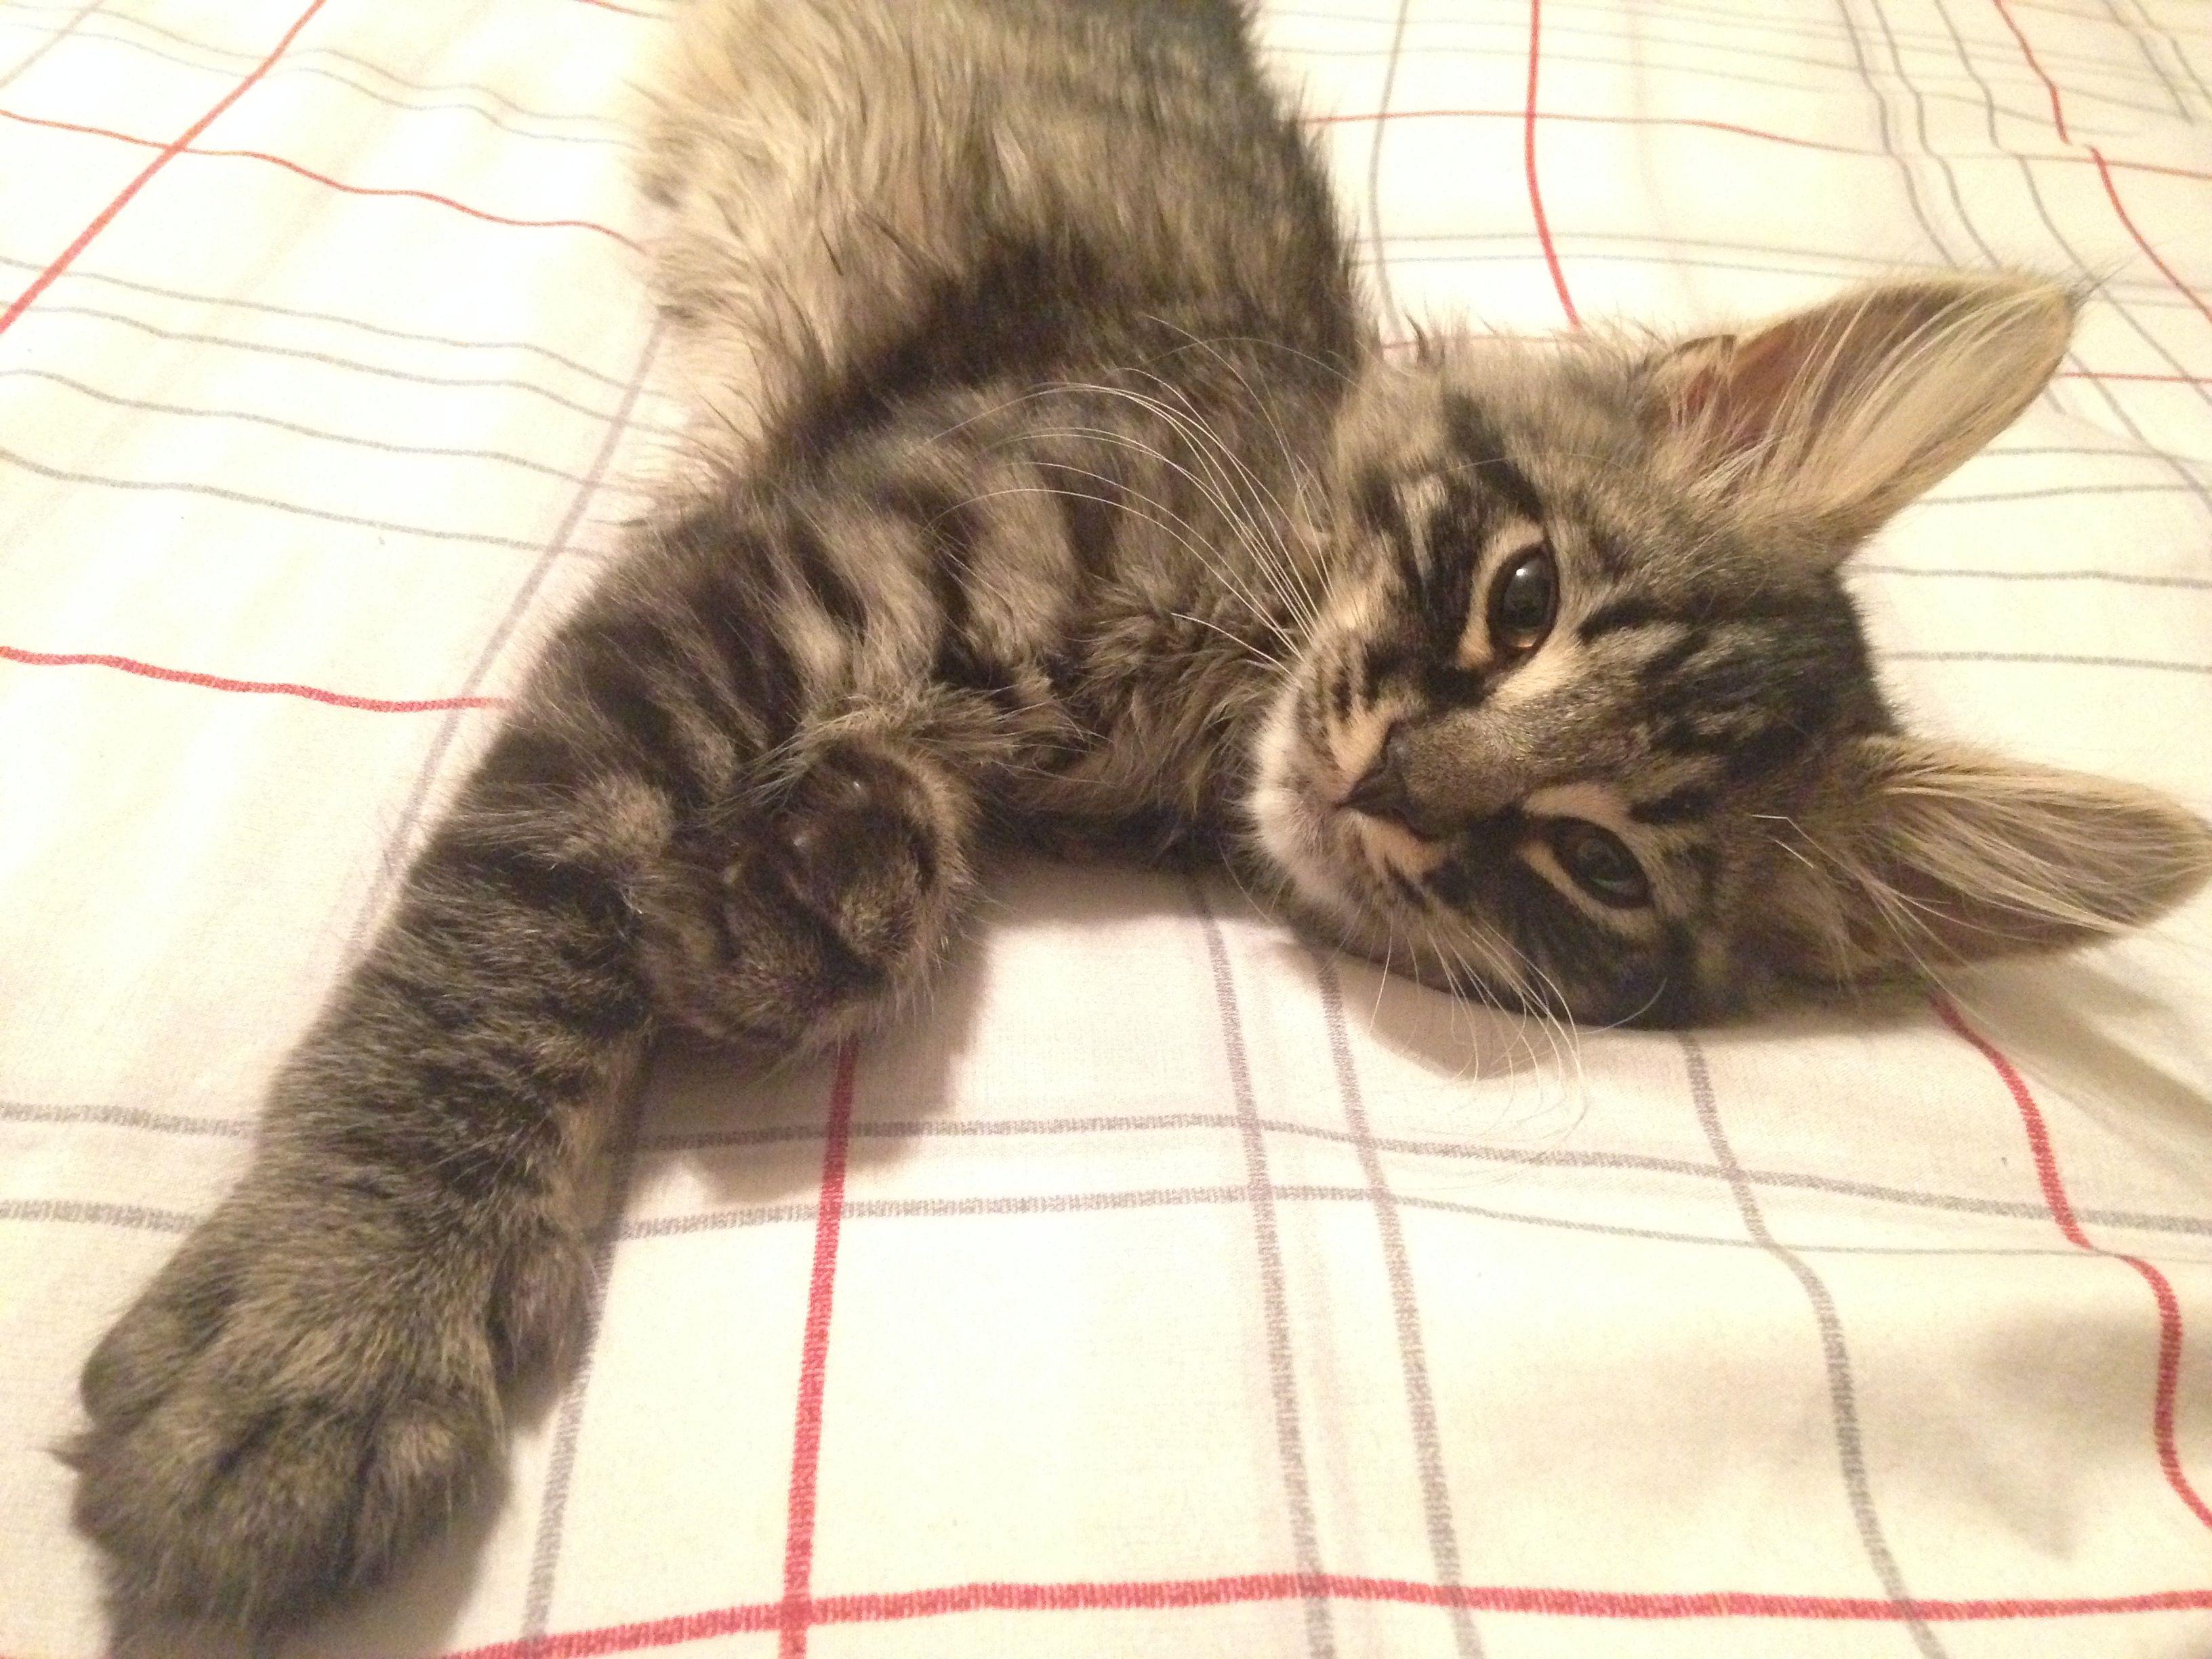 Sev The Almost 14 Week Old Kitten Kitten Animals Cats